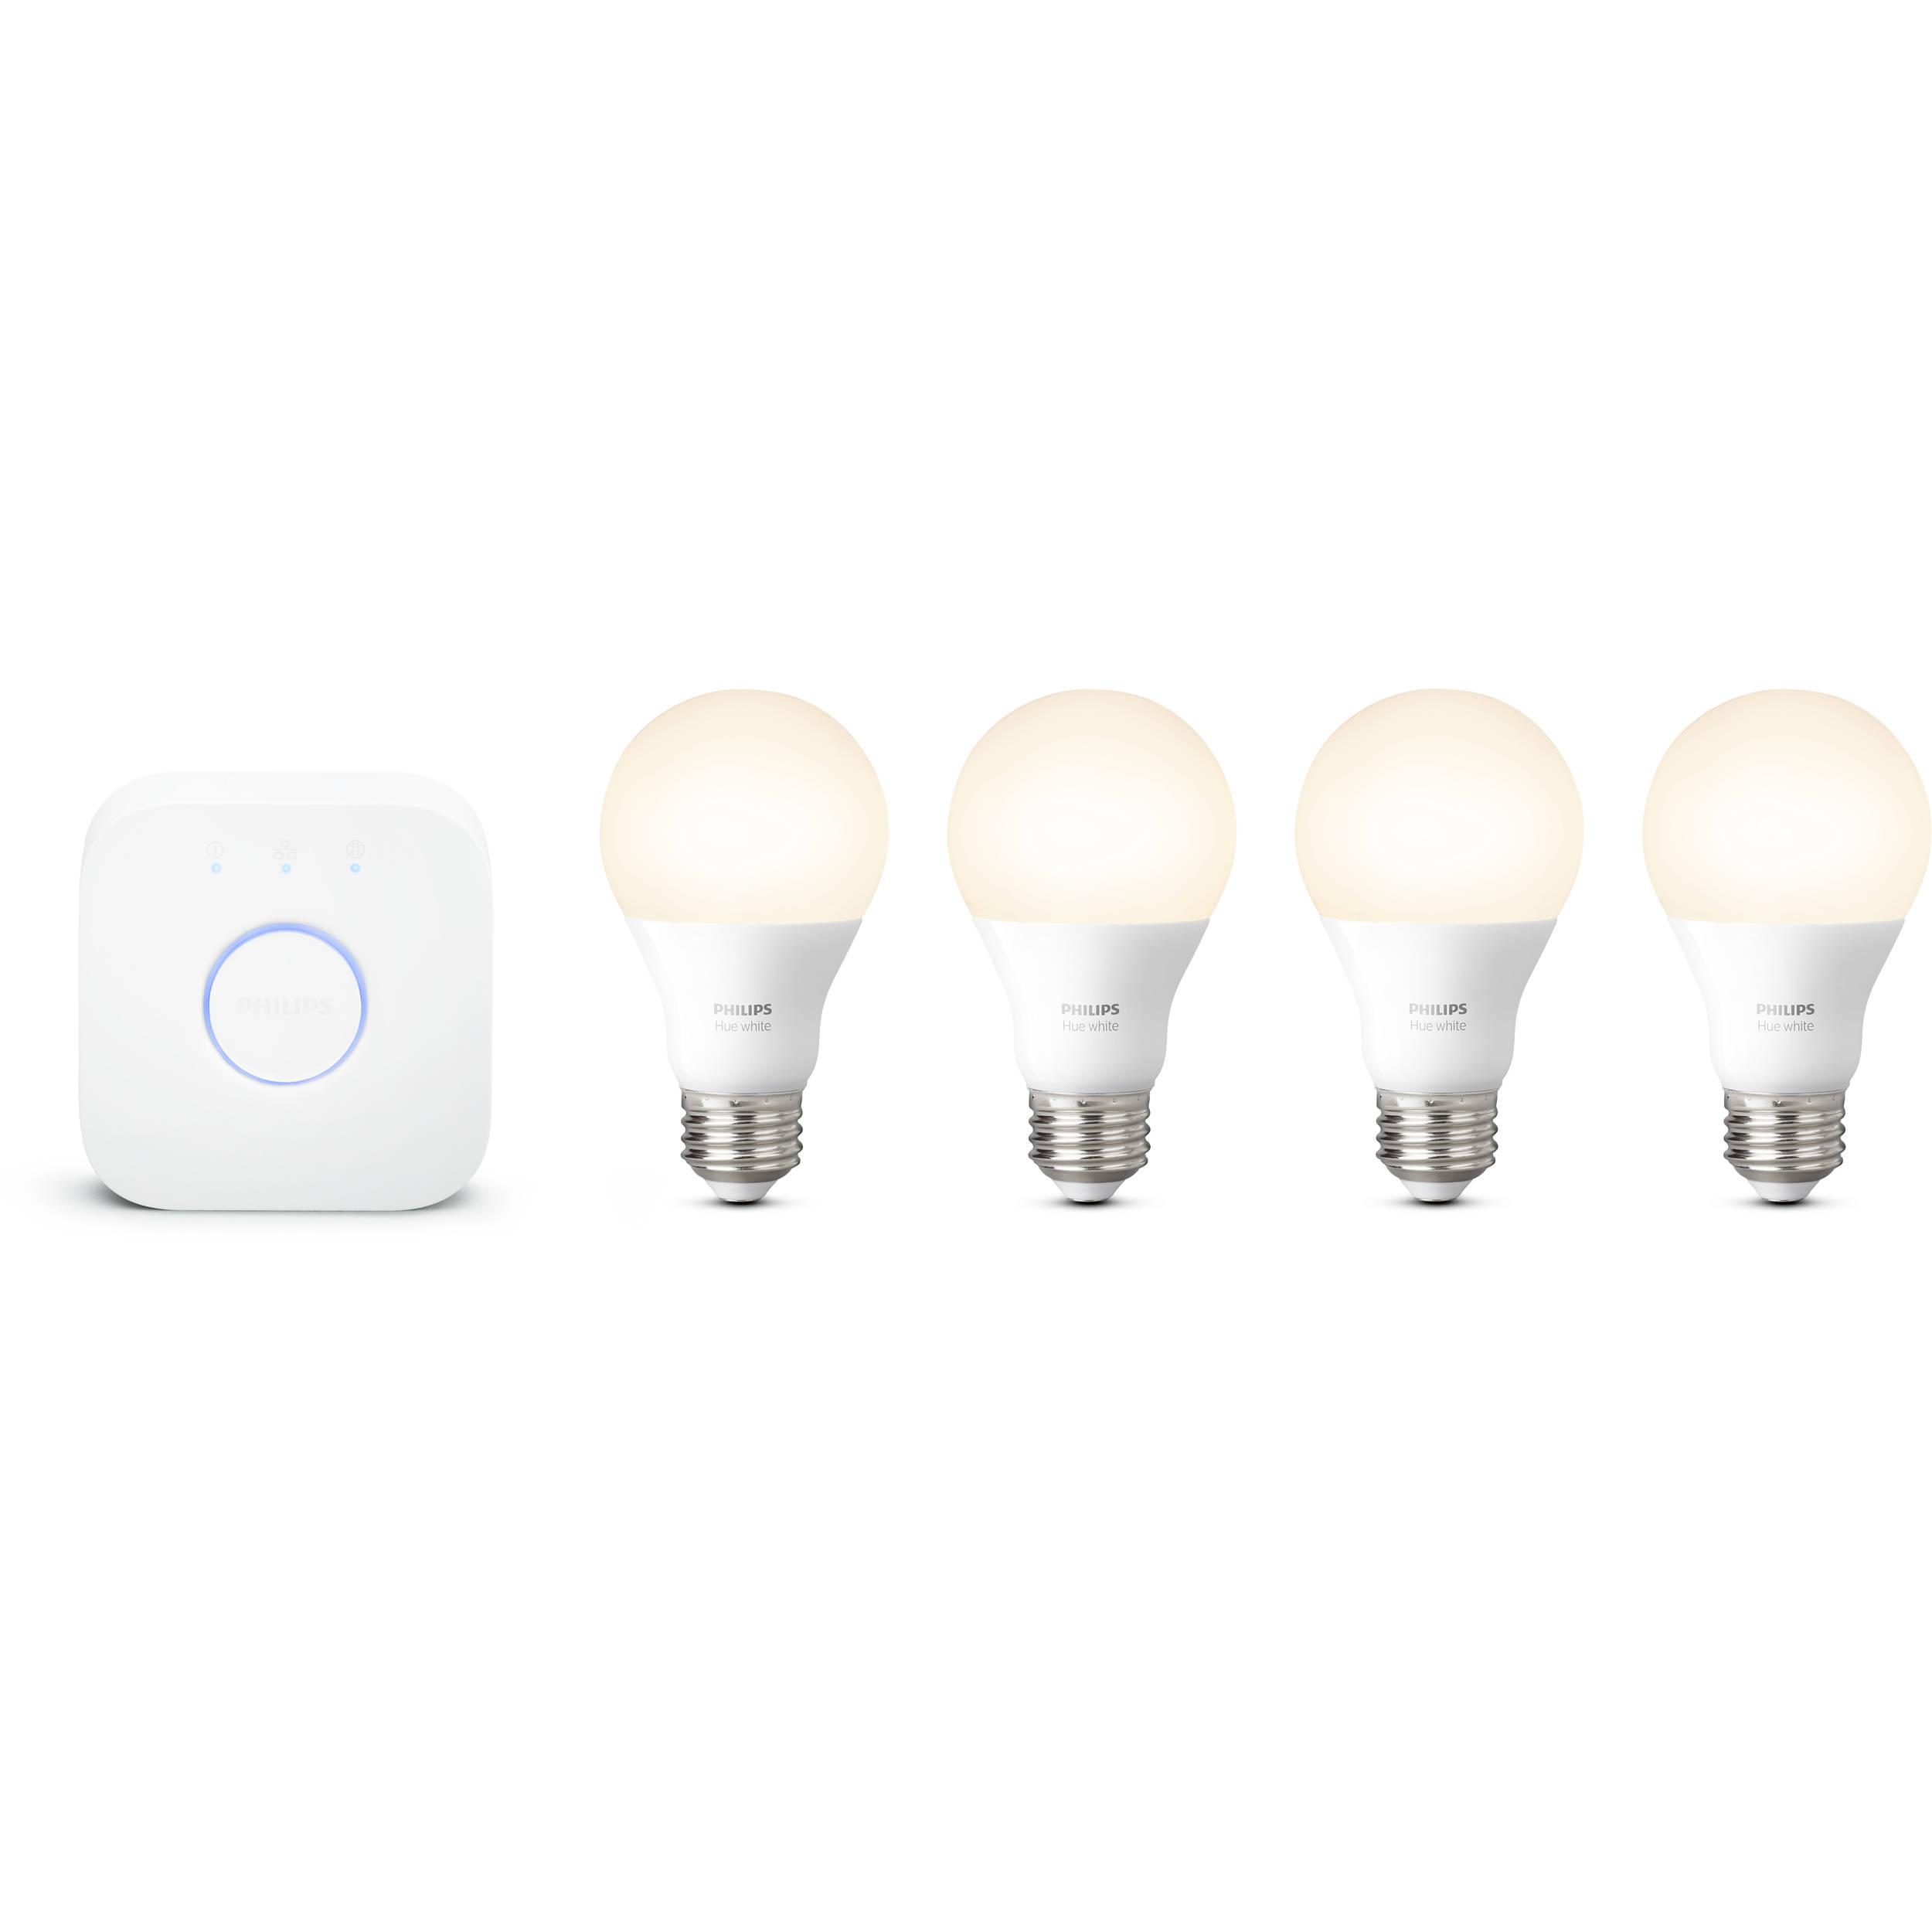 4 A19 Bulbs and 1 Bridge Compatible... Philips Hue White Smart Bulb Starter Kit